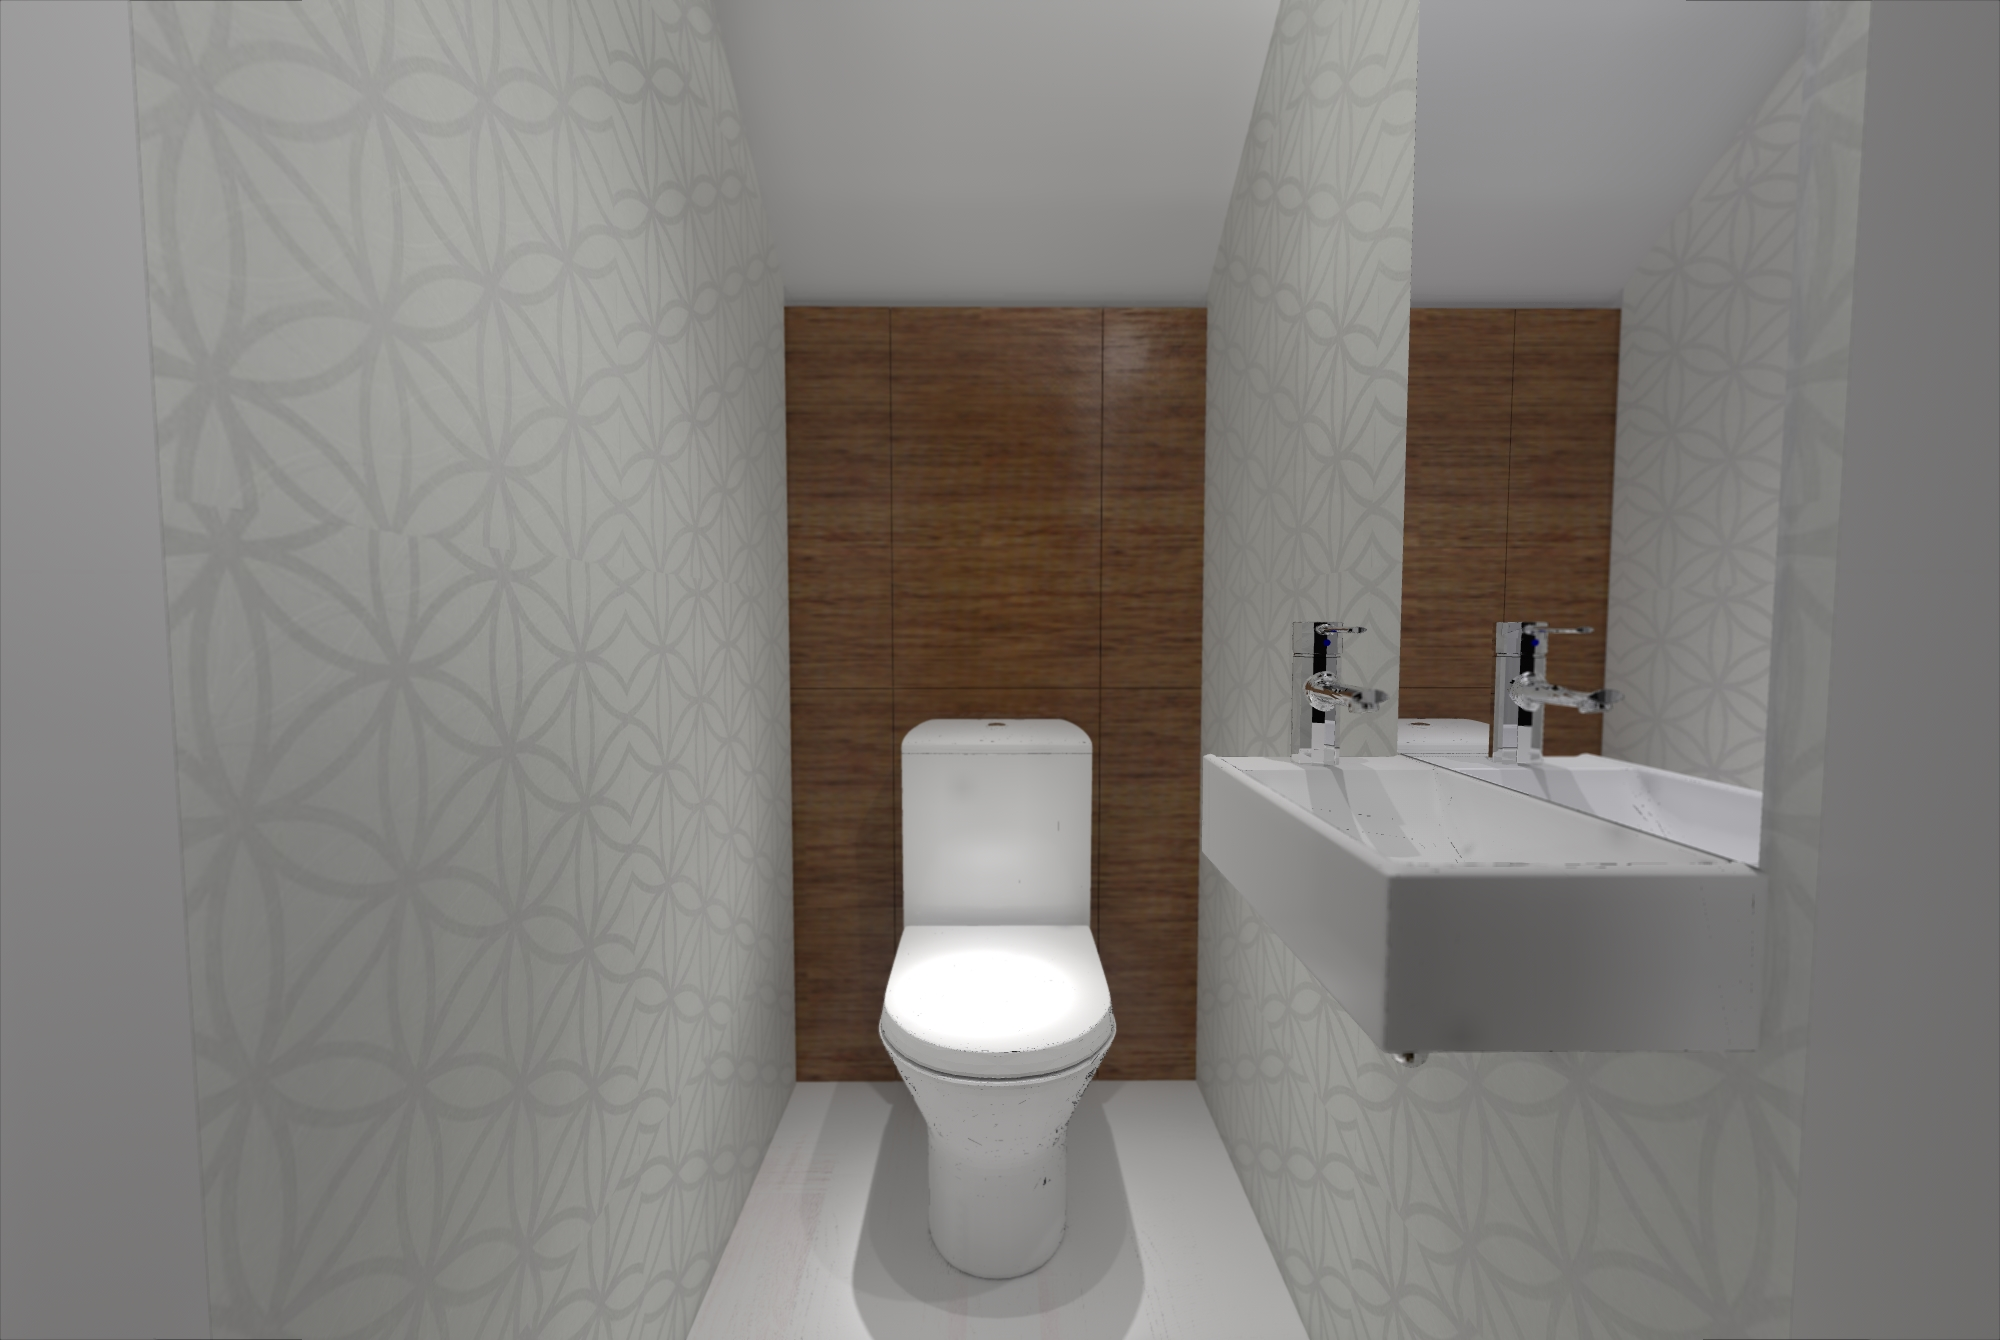 Gdynia Kettlinga Toaleta Pod Schodami Chatanowa Aranzacja